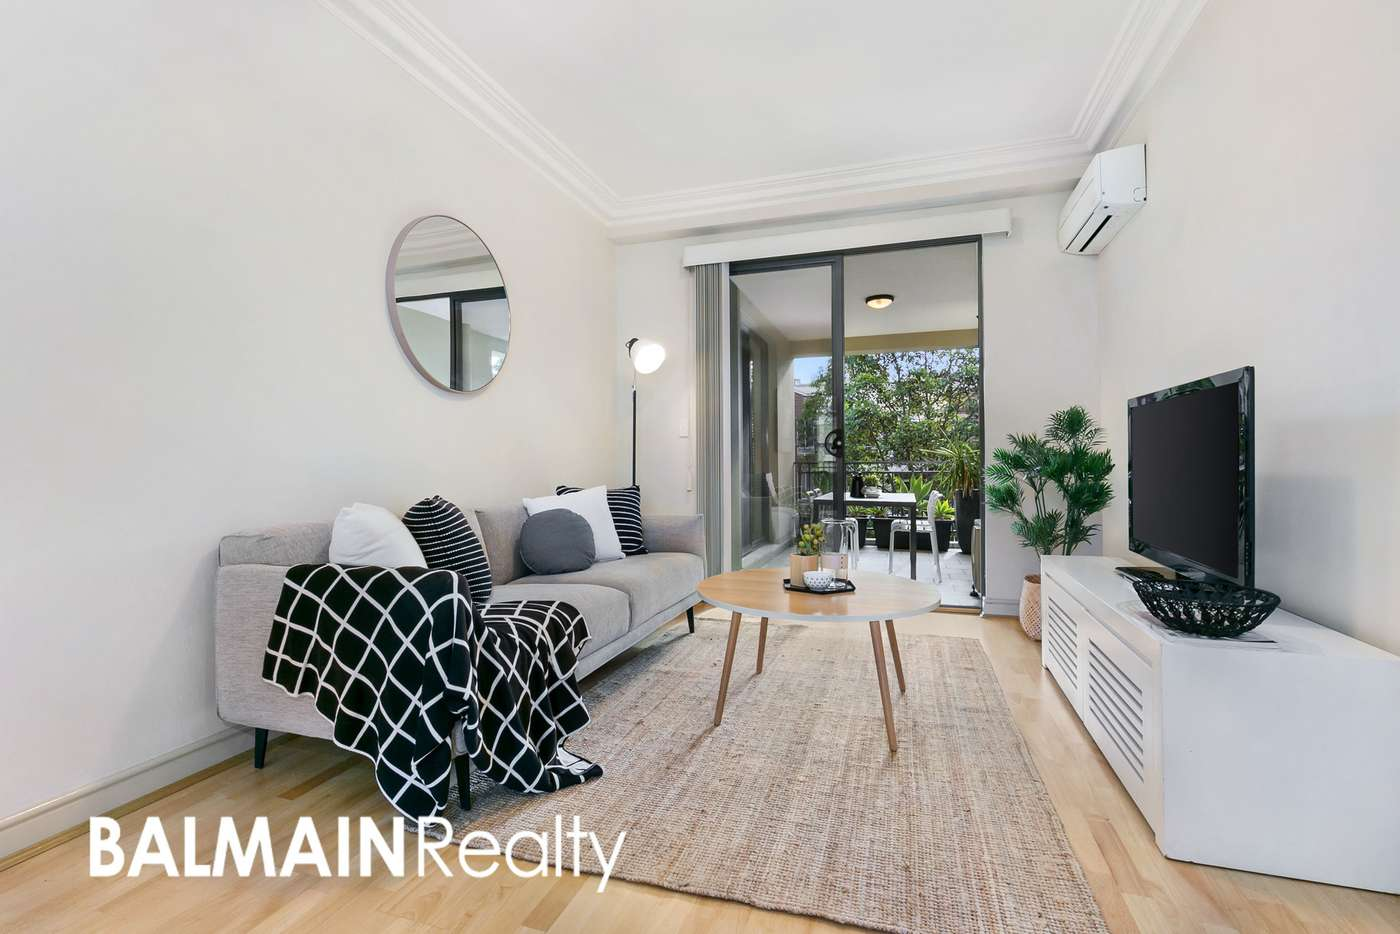 Main view of Homely apartment listing, A16/1 Buchanan Street, Balmain NSW 2041